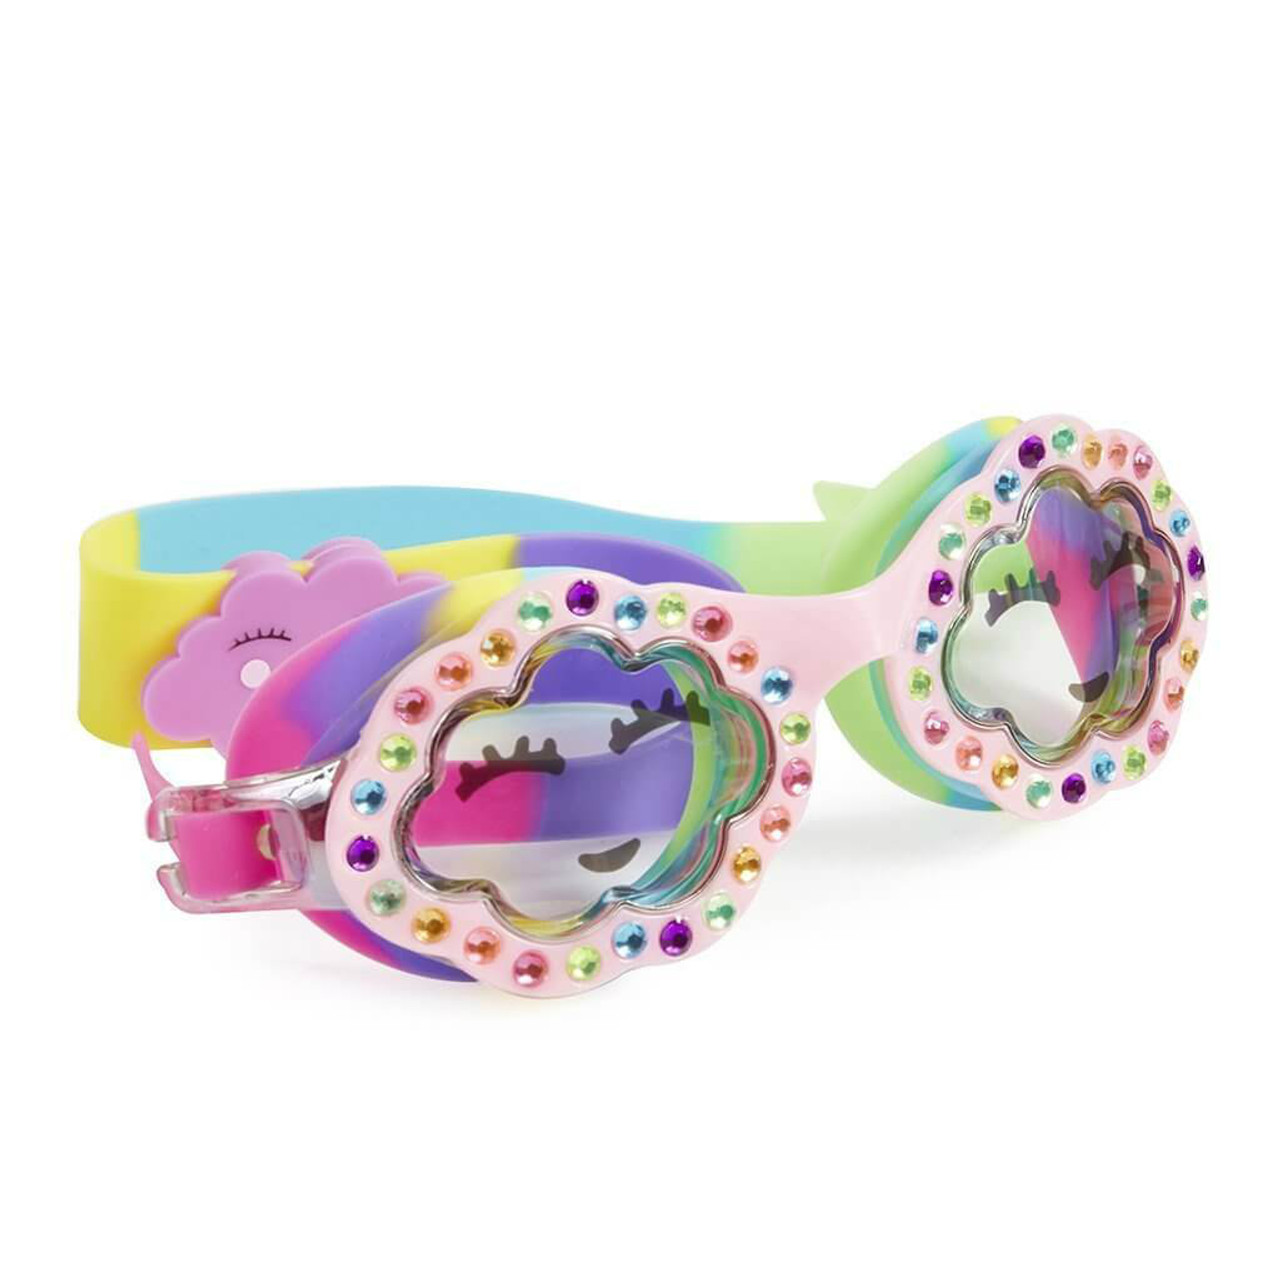 4a6b248efc75 Girls Goggles - Cloud 9 Dreamy Pink Kids  Swim Goggle